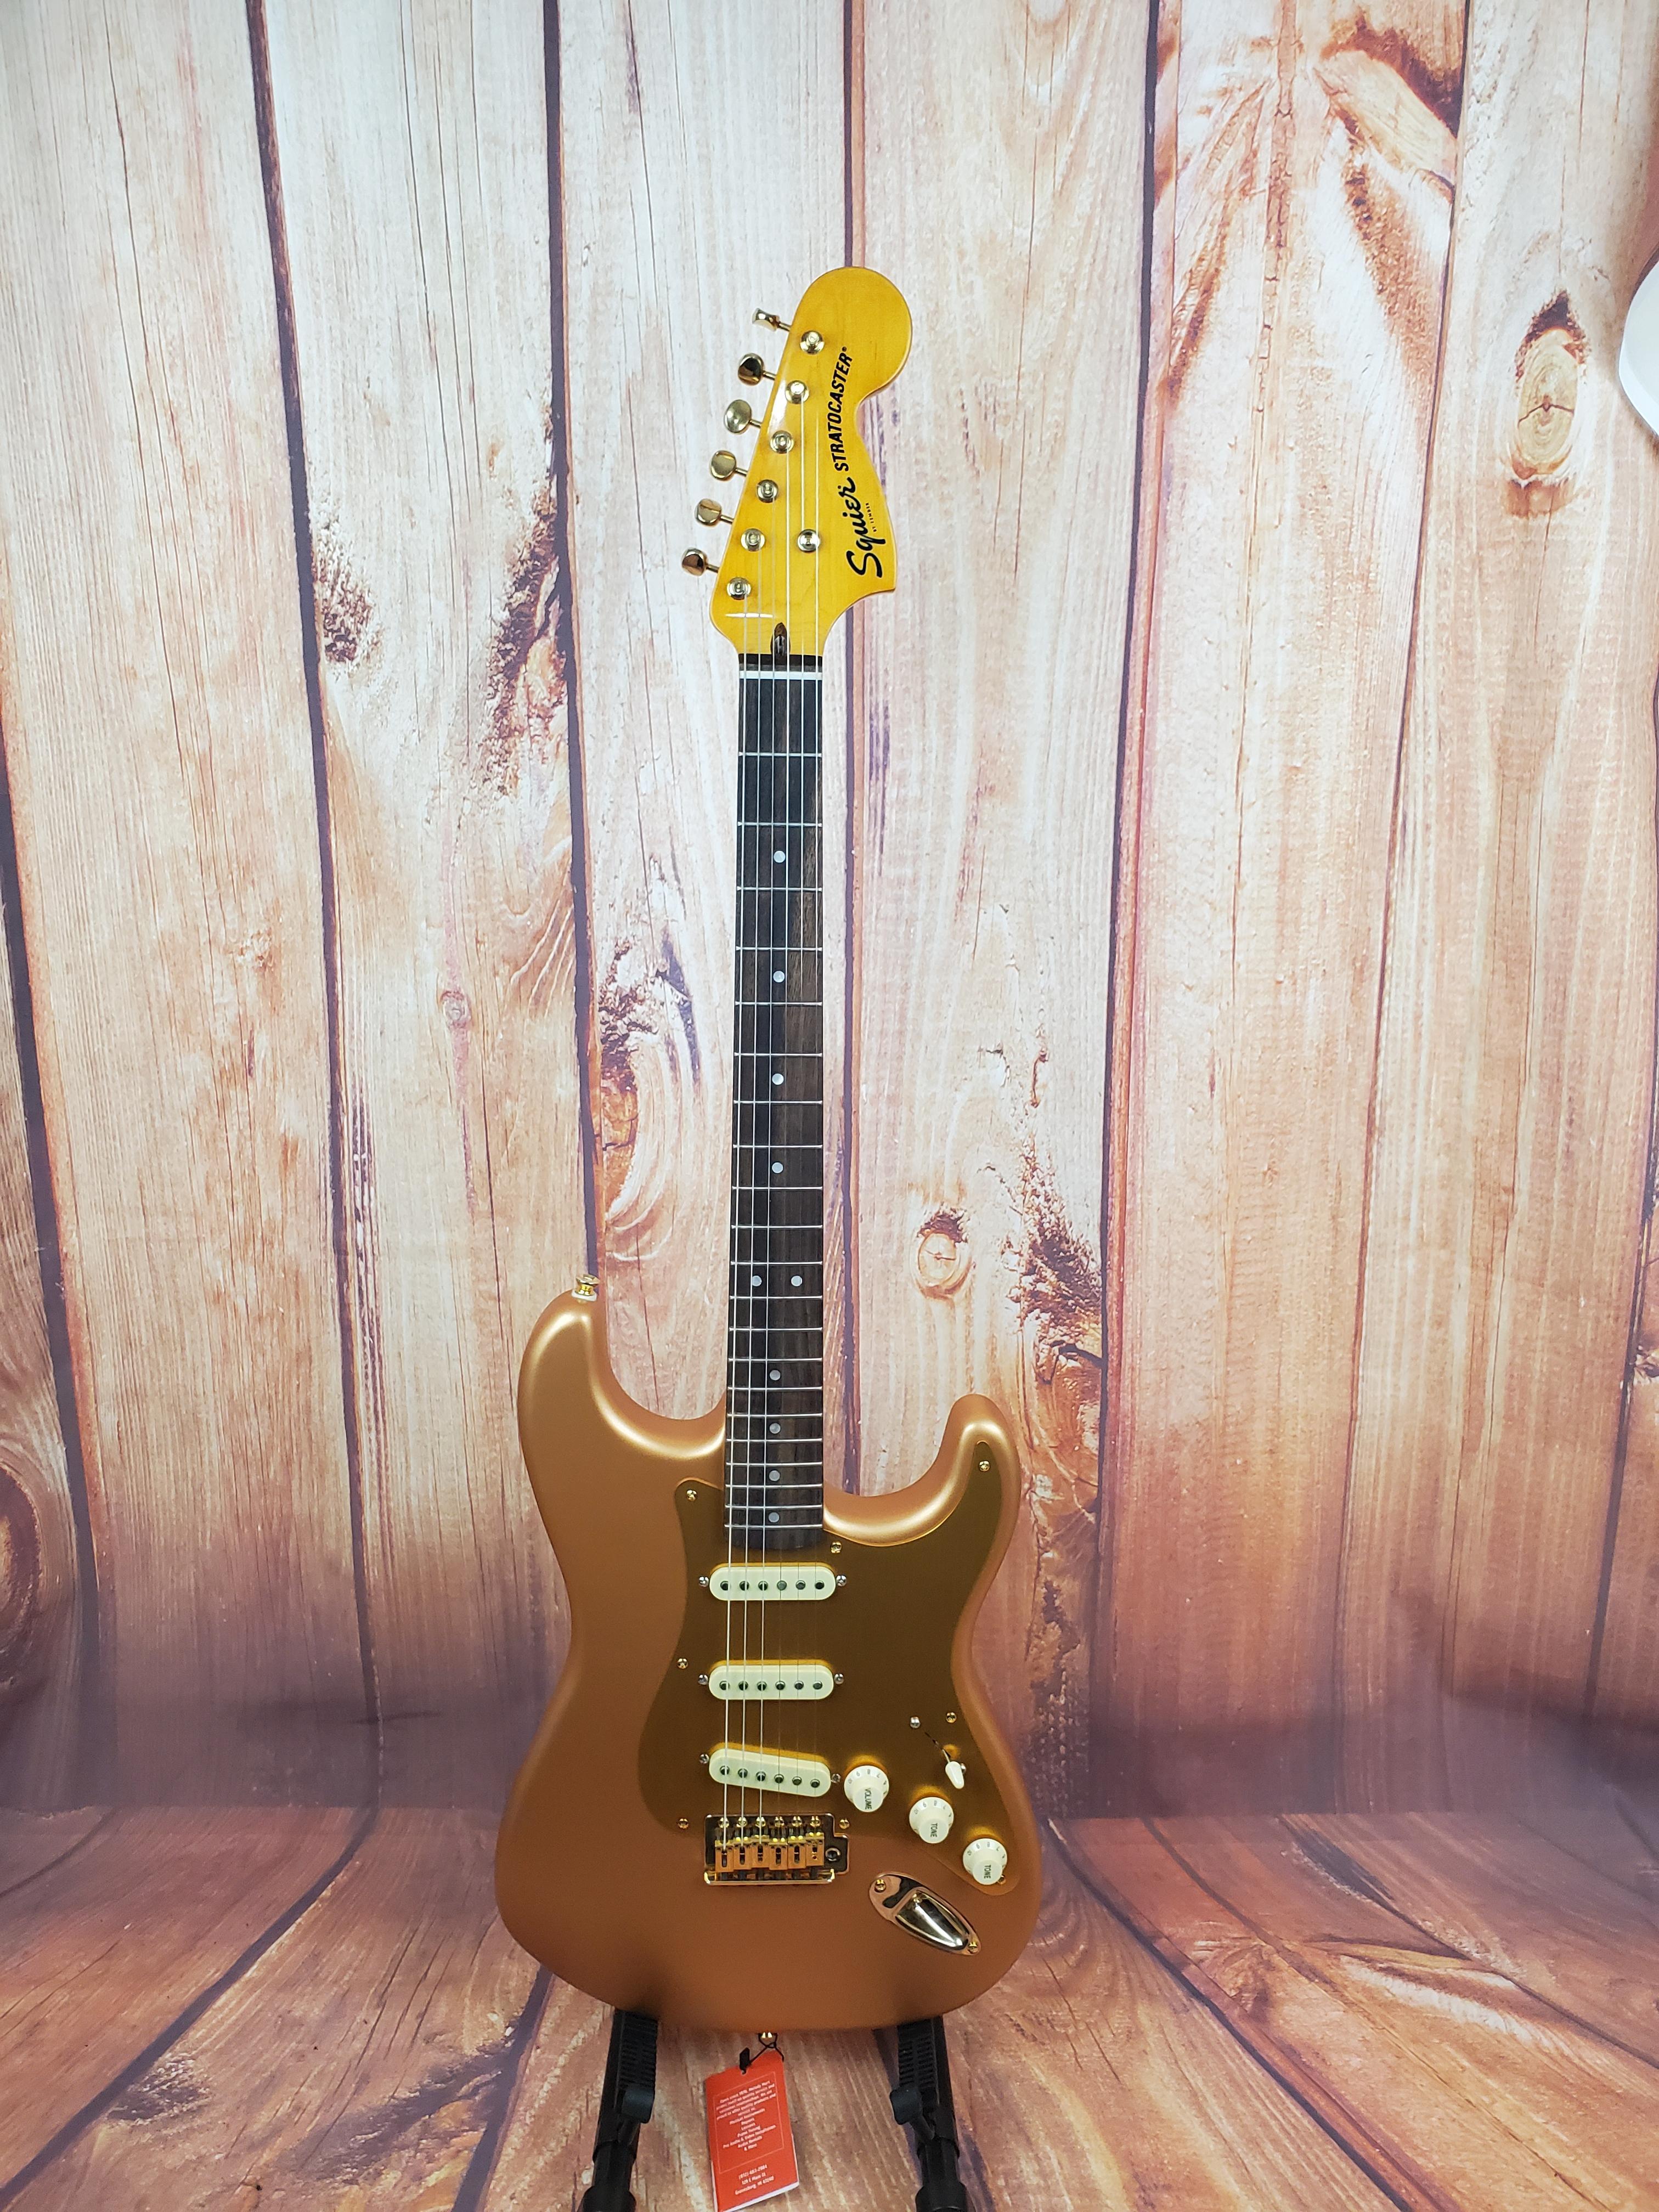 Squier Classic Vibe '70s Stratocaster-Custom Paint Job